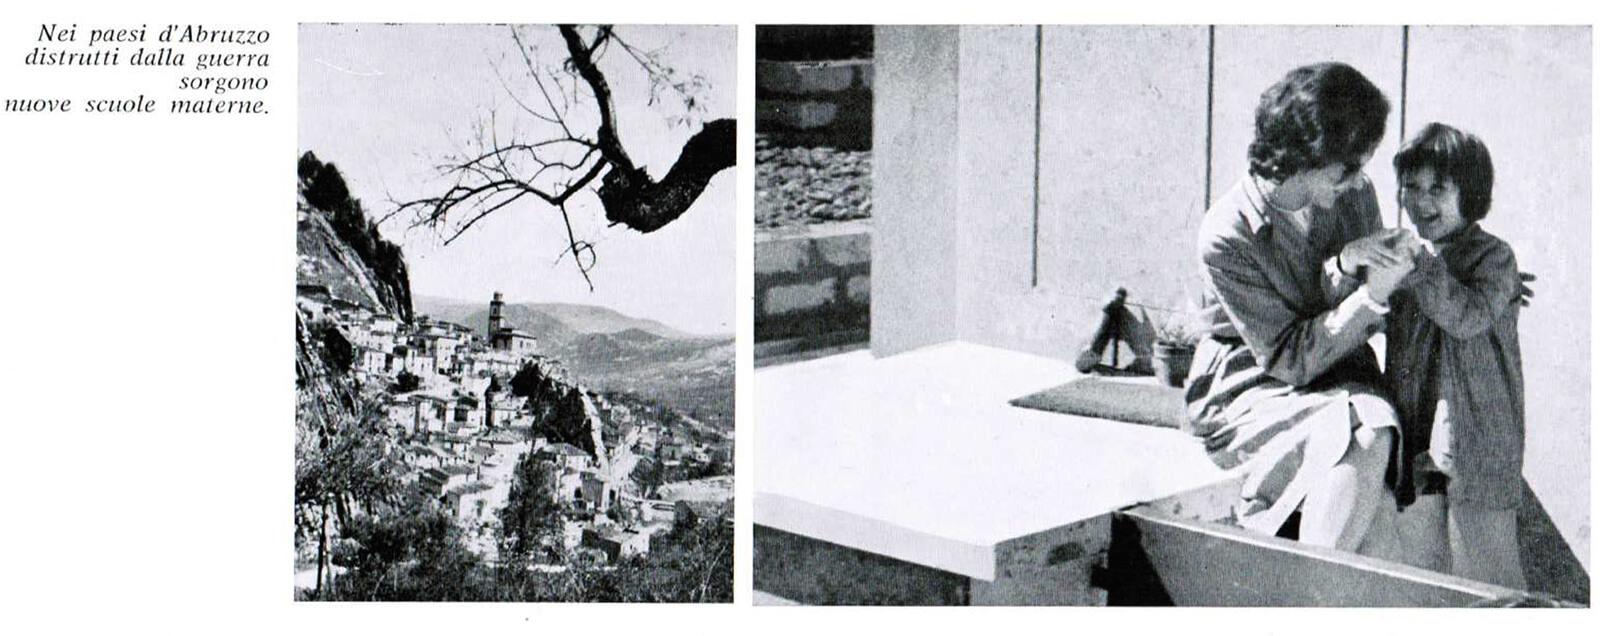 Visual arts - Black and white